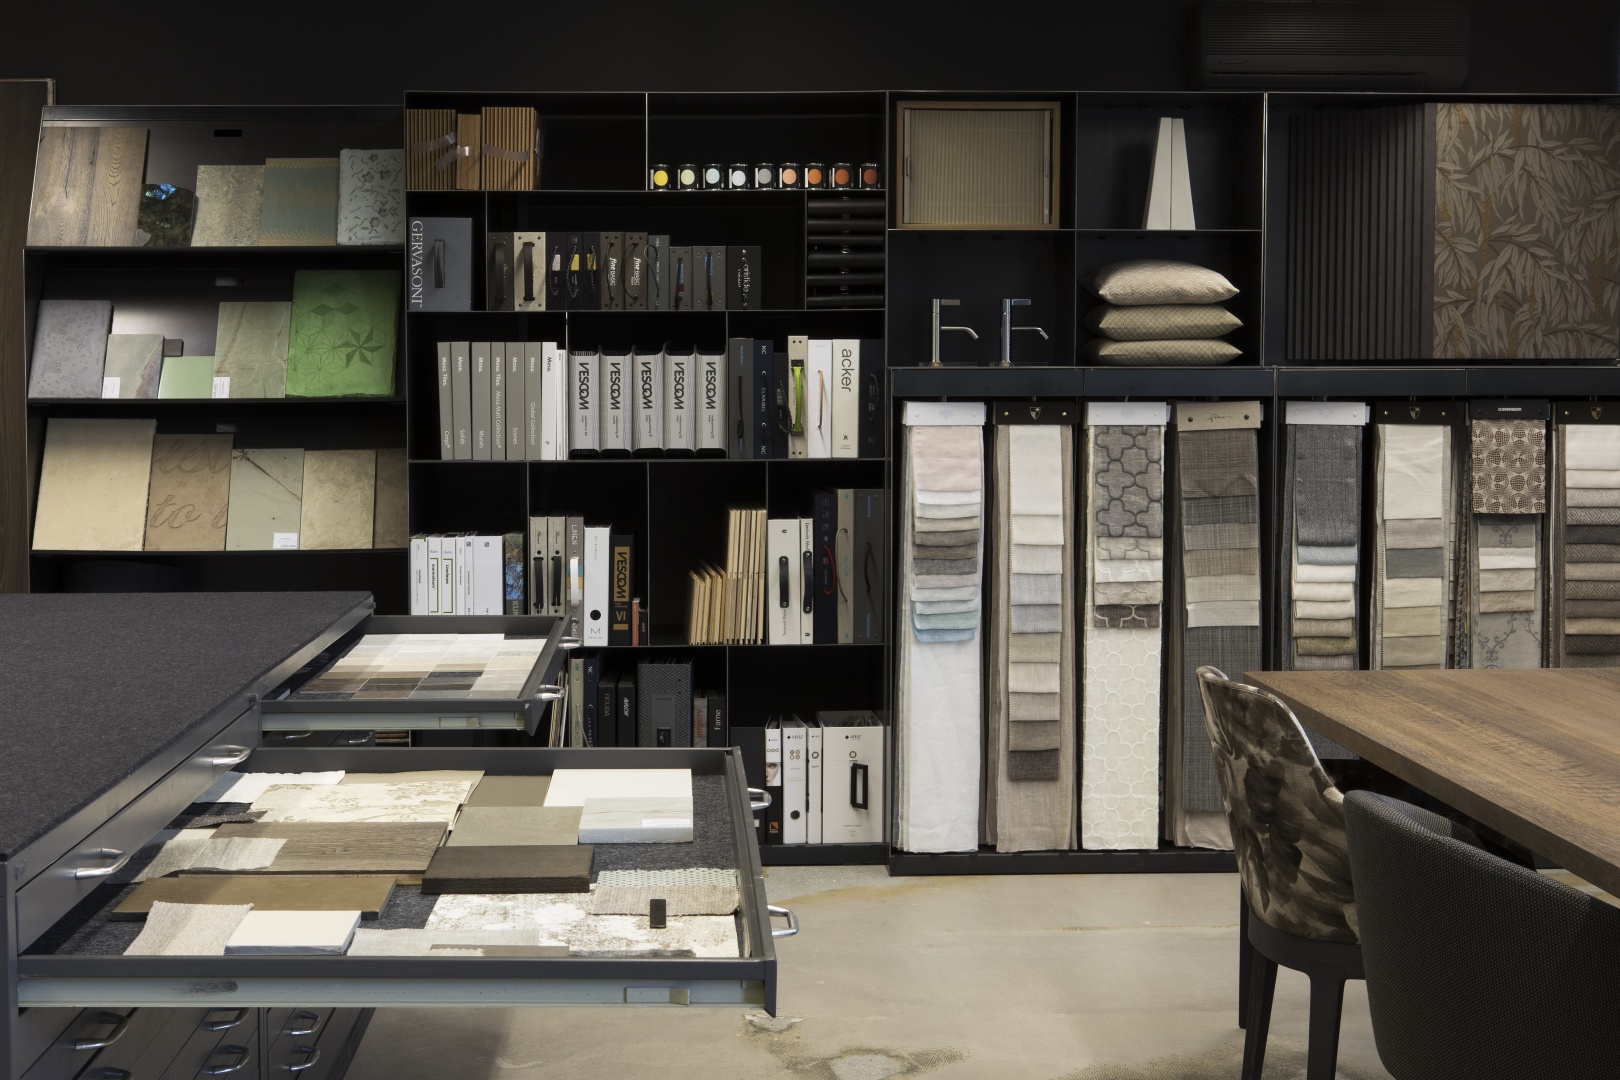 materialbibliothek_goodinteriors_4 © good interiors gmbh / Sibylle Meier